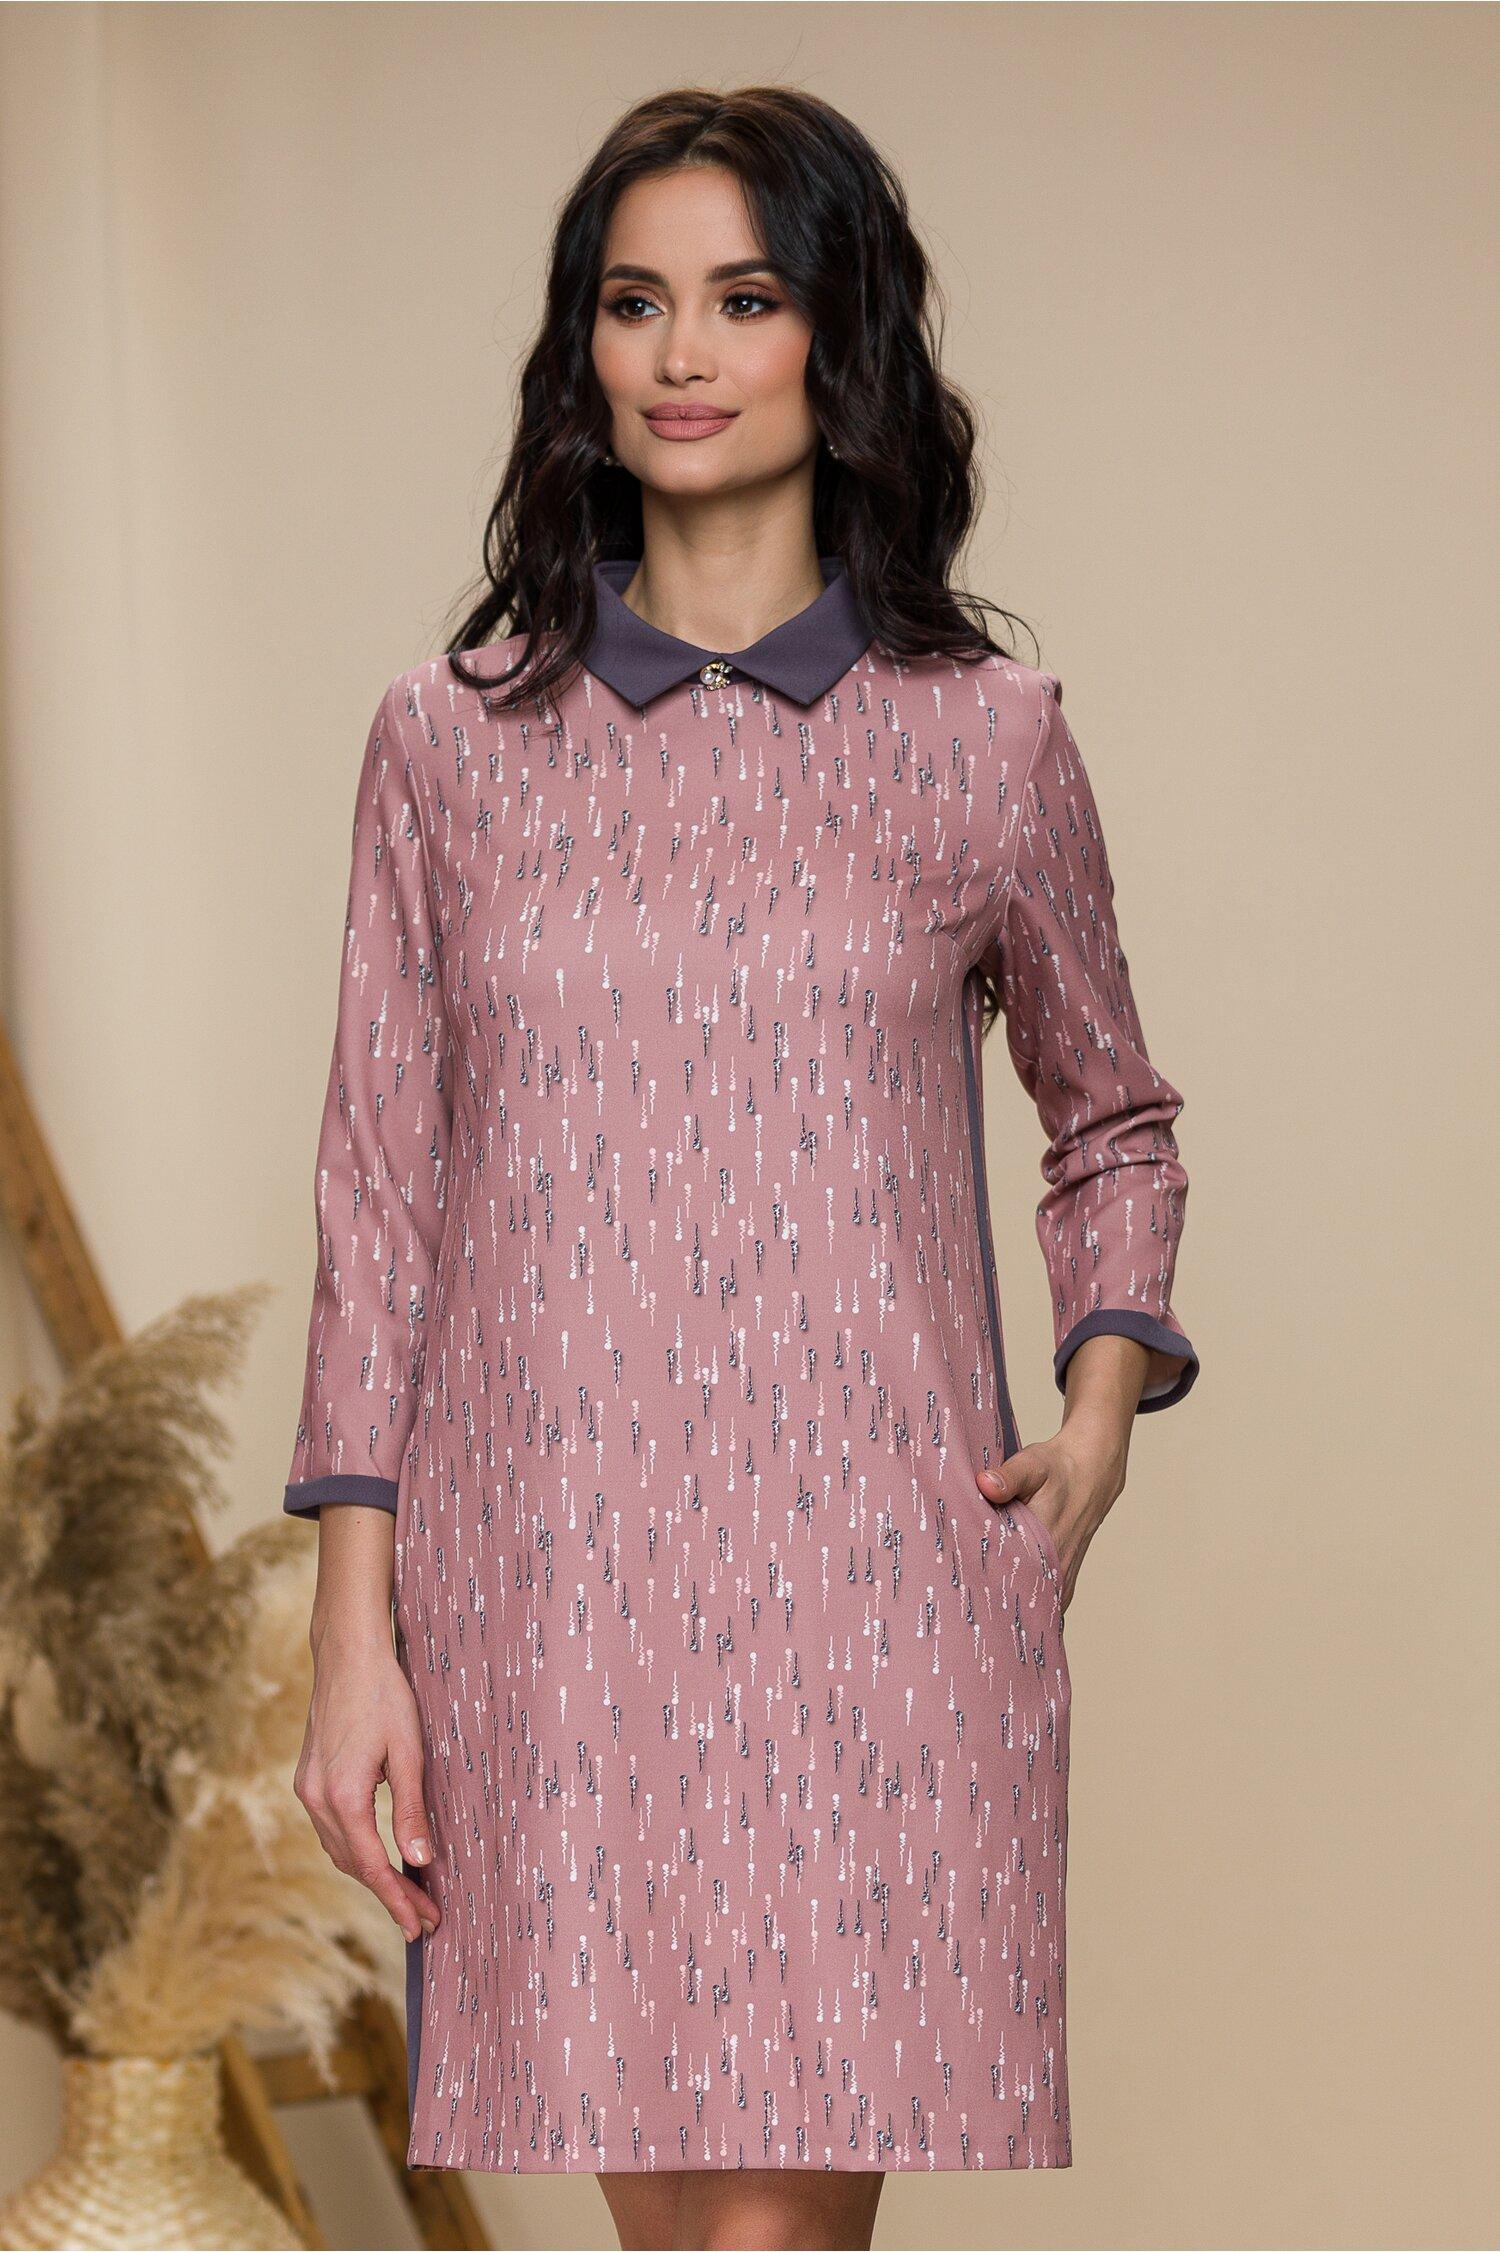 Rochie Anais roz cu imprimeuri si guler gri